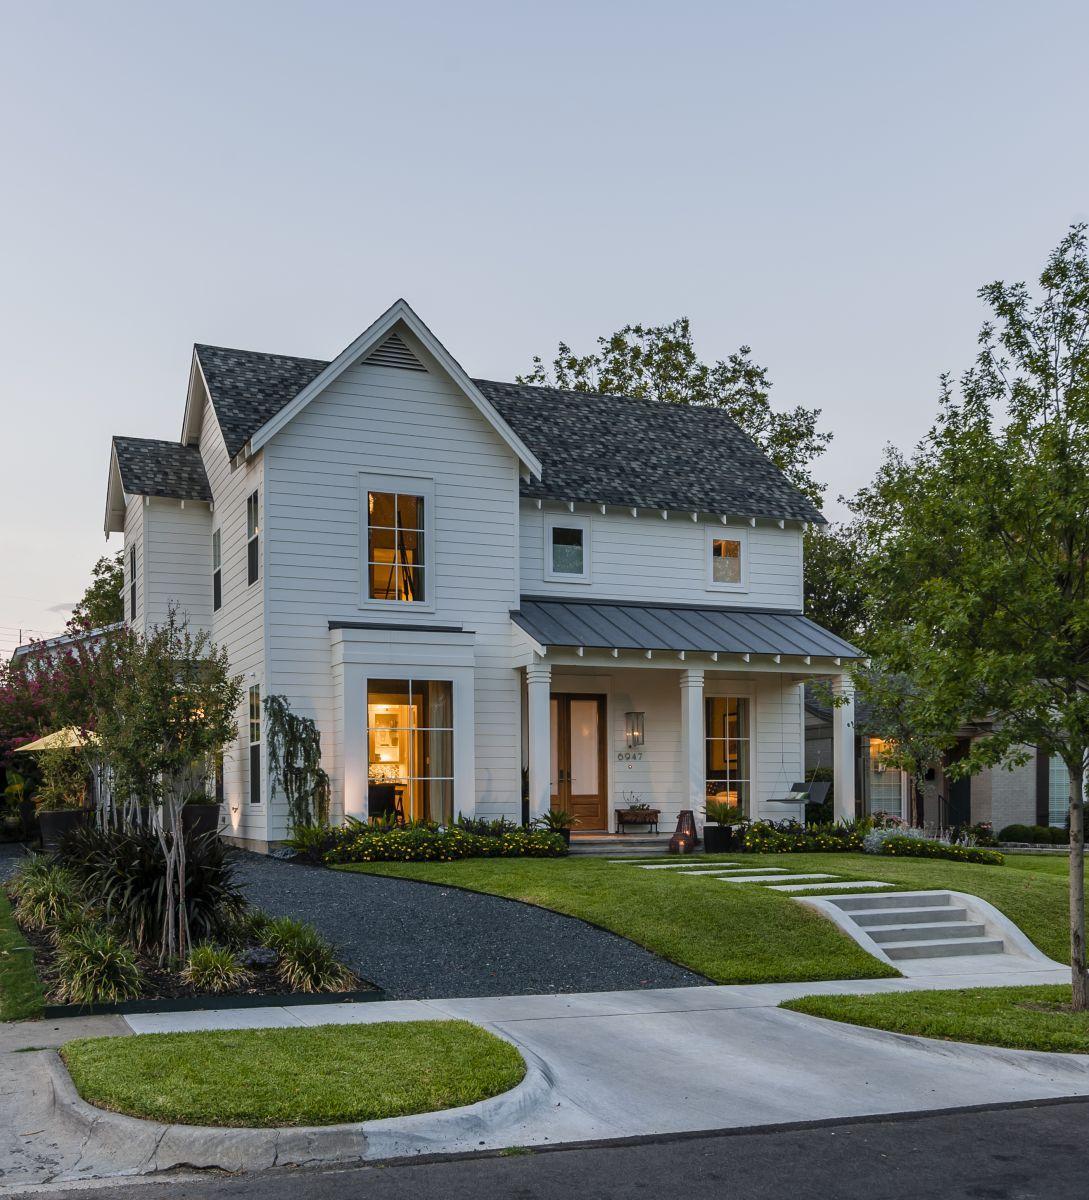 Modern Farmhouse Exterior Designs 11: Pin By Josh Bennett On Home Exterior